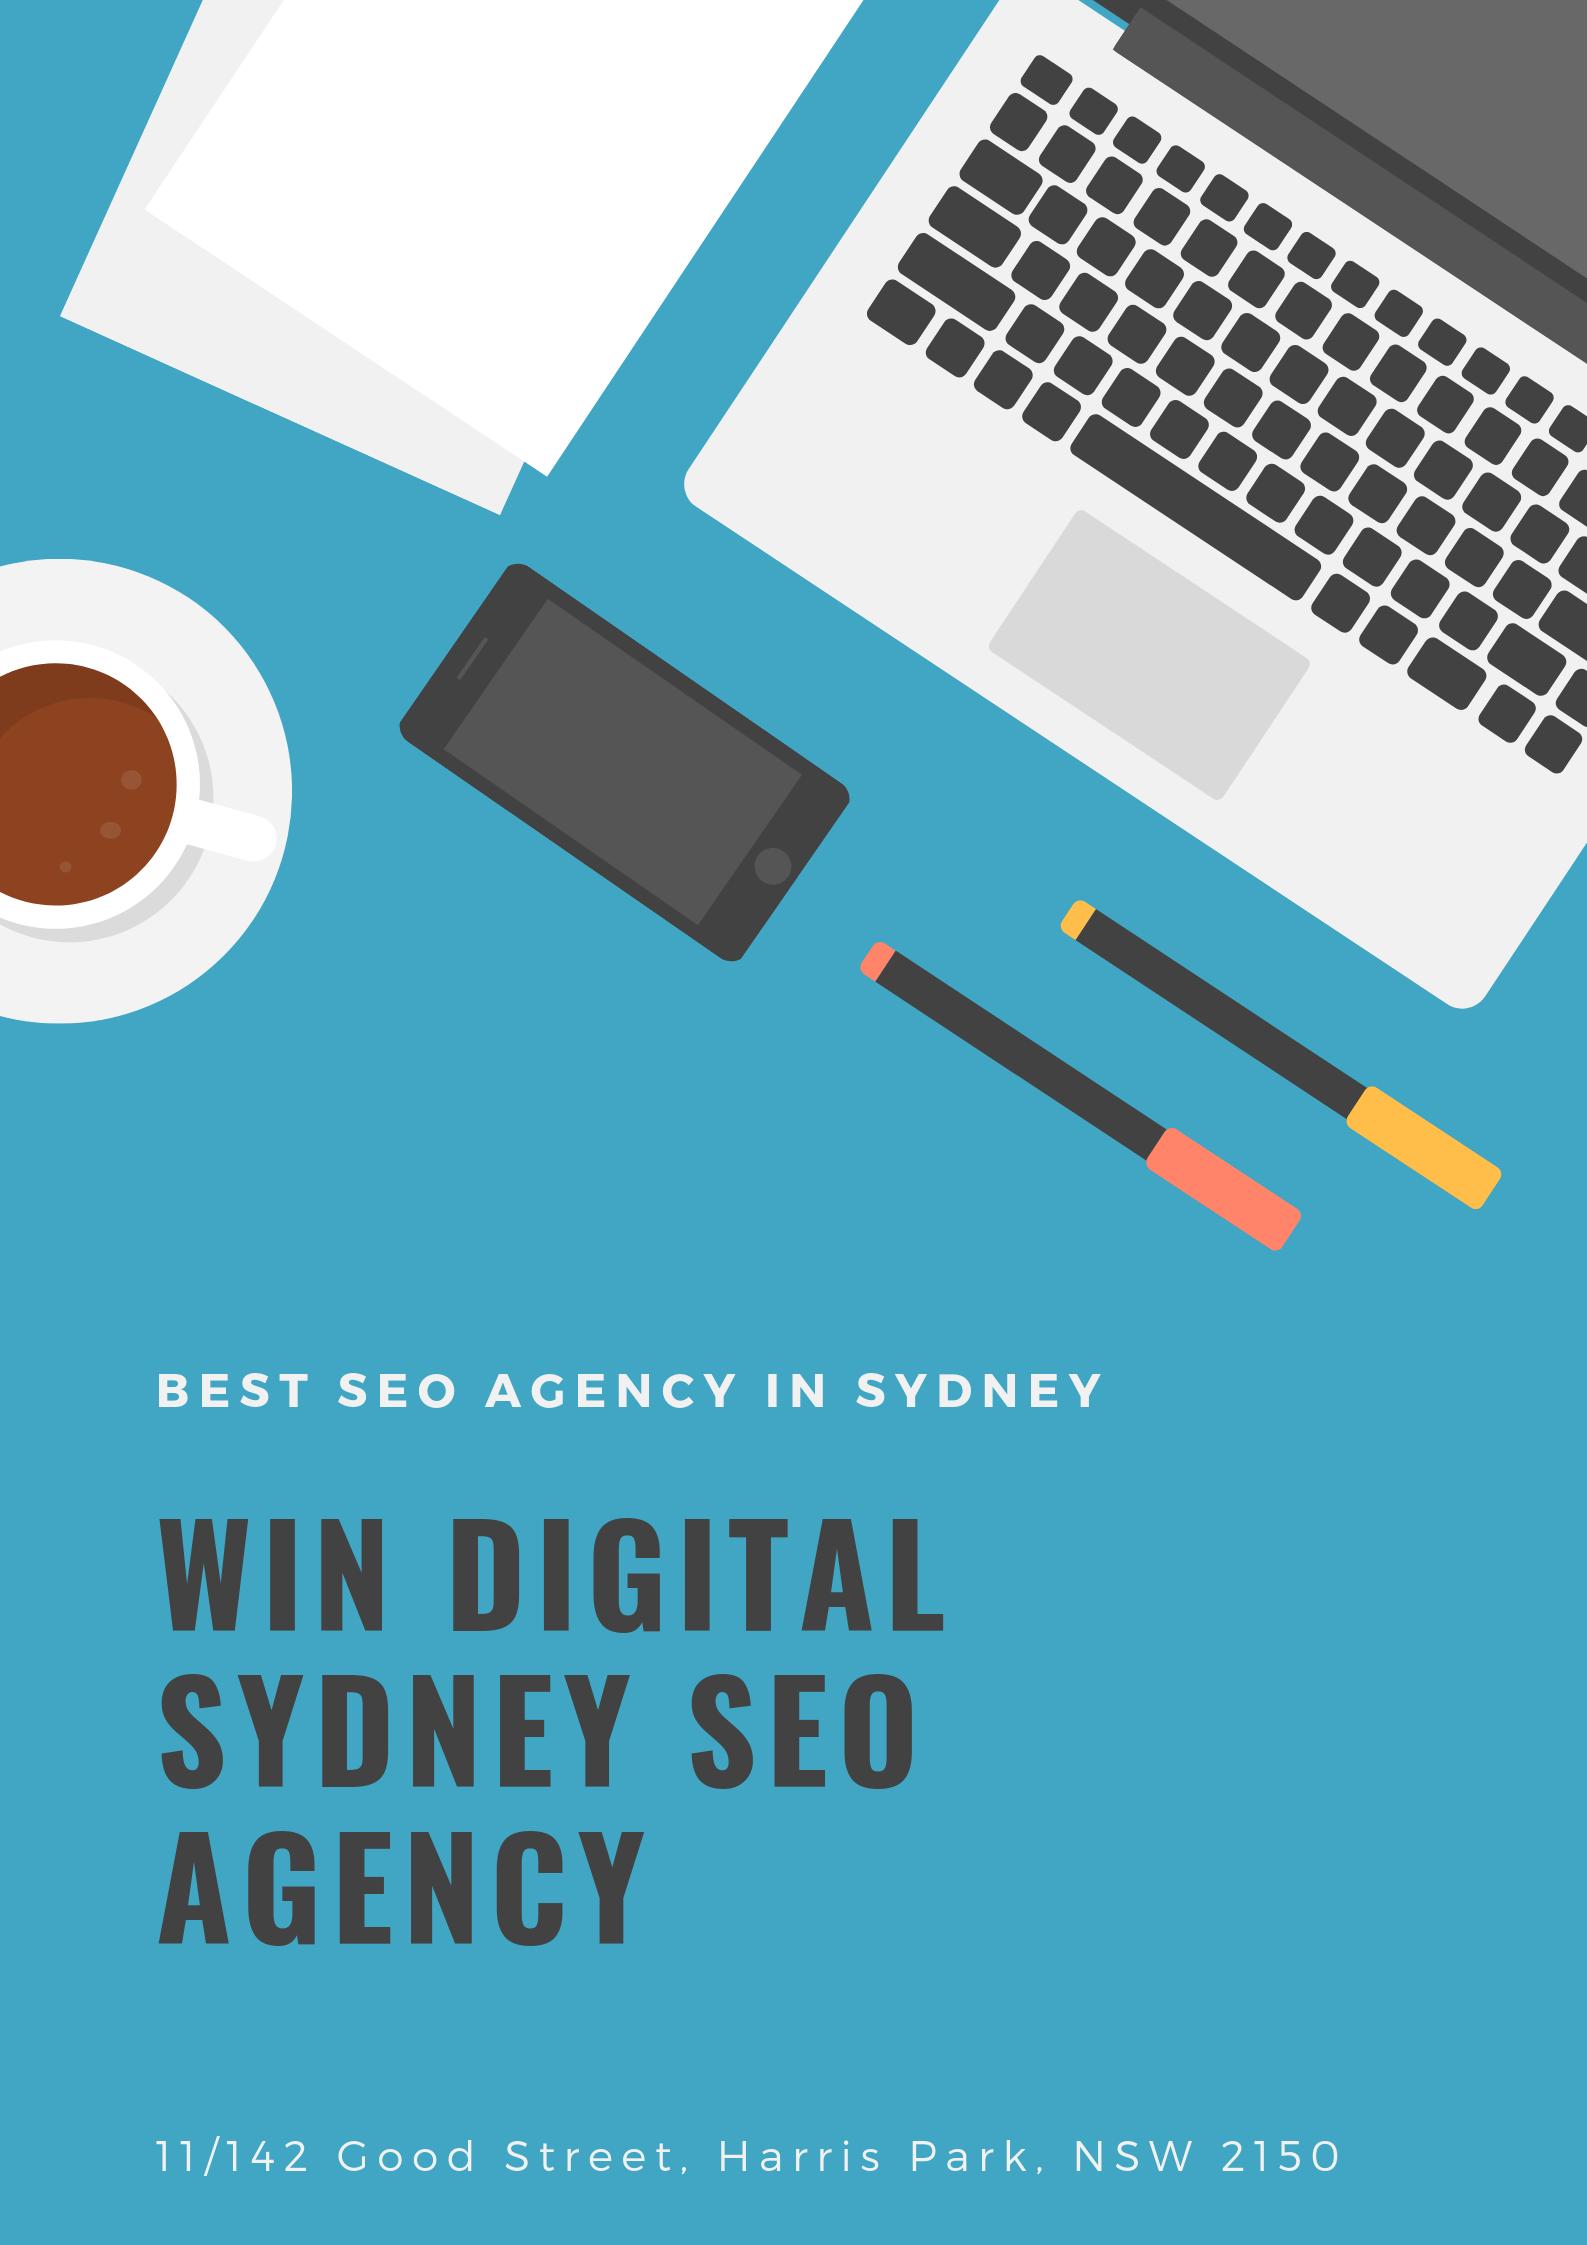 Win Digital Best Sydney Seo Agency Affiliate Marketing Geld Verdienen Online Geld Verdienen